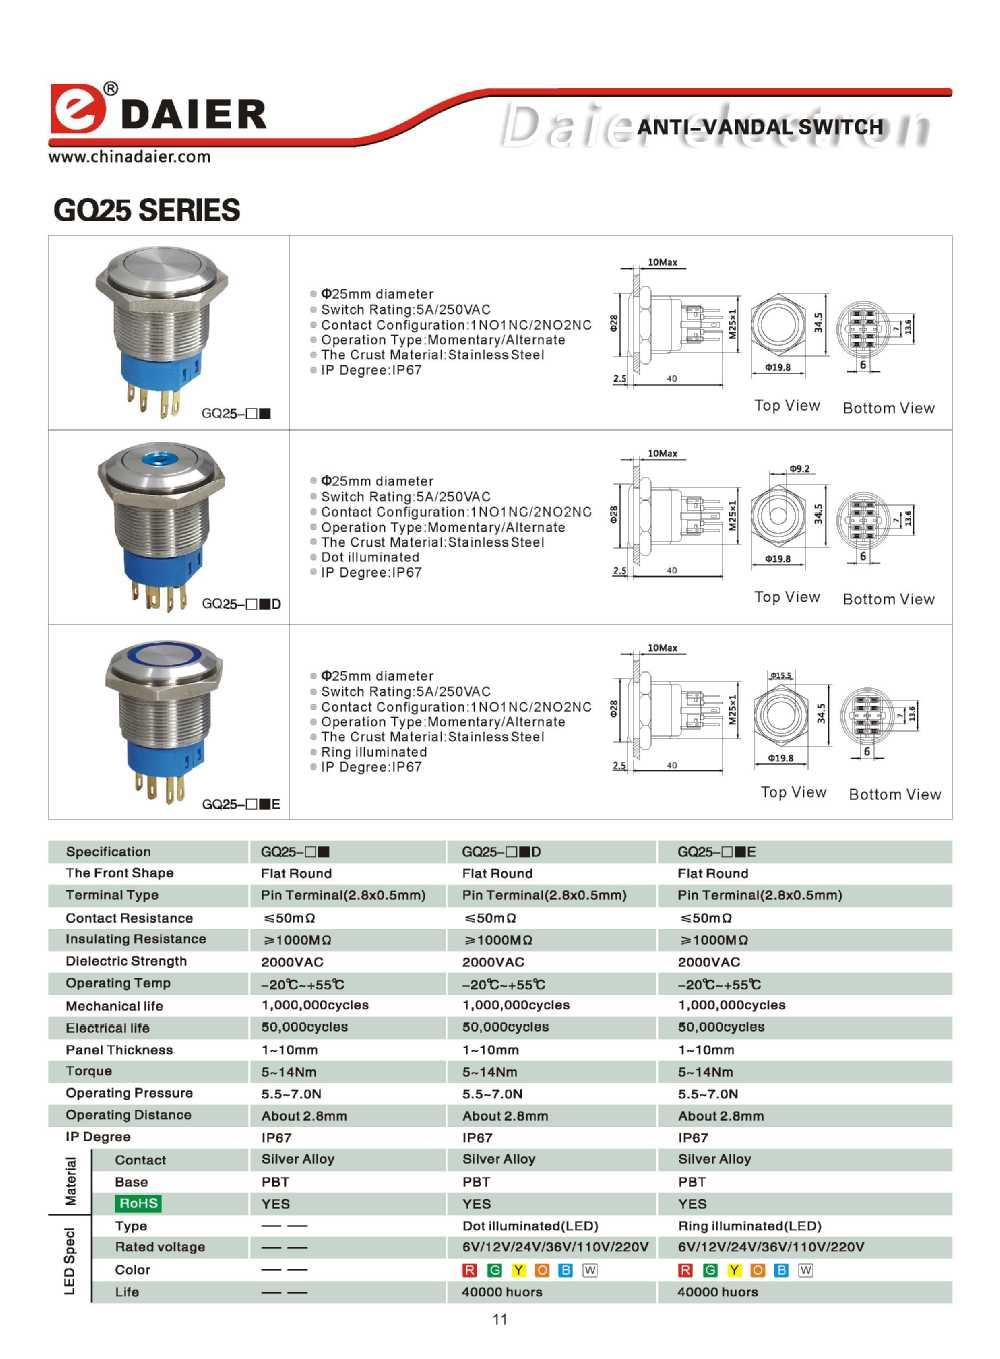 Daier 22mm Led Push Button Switch Buy Vandal Wiring Diagram Anti 12